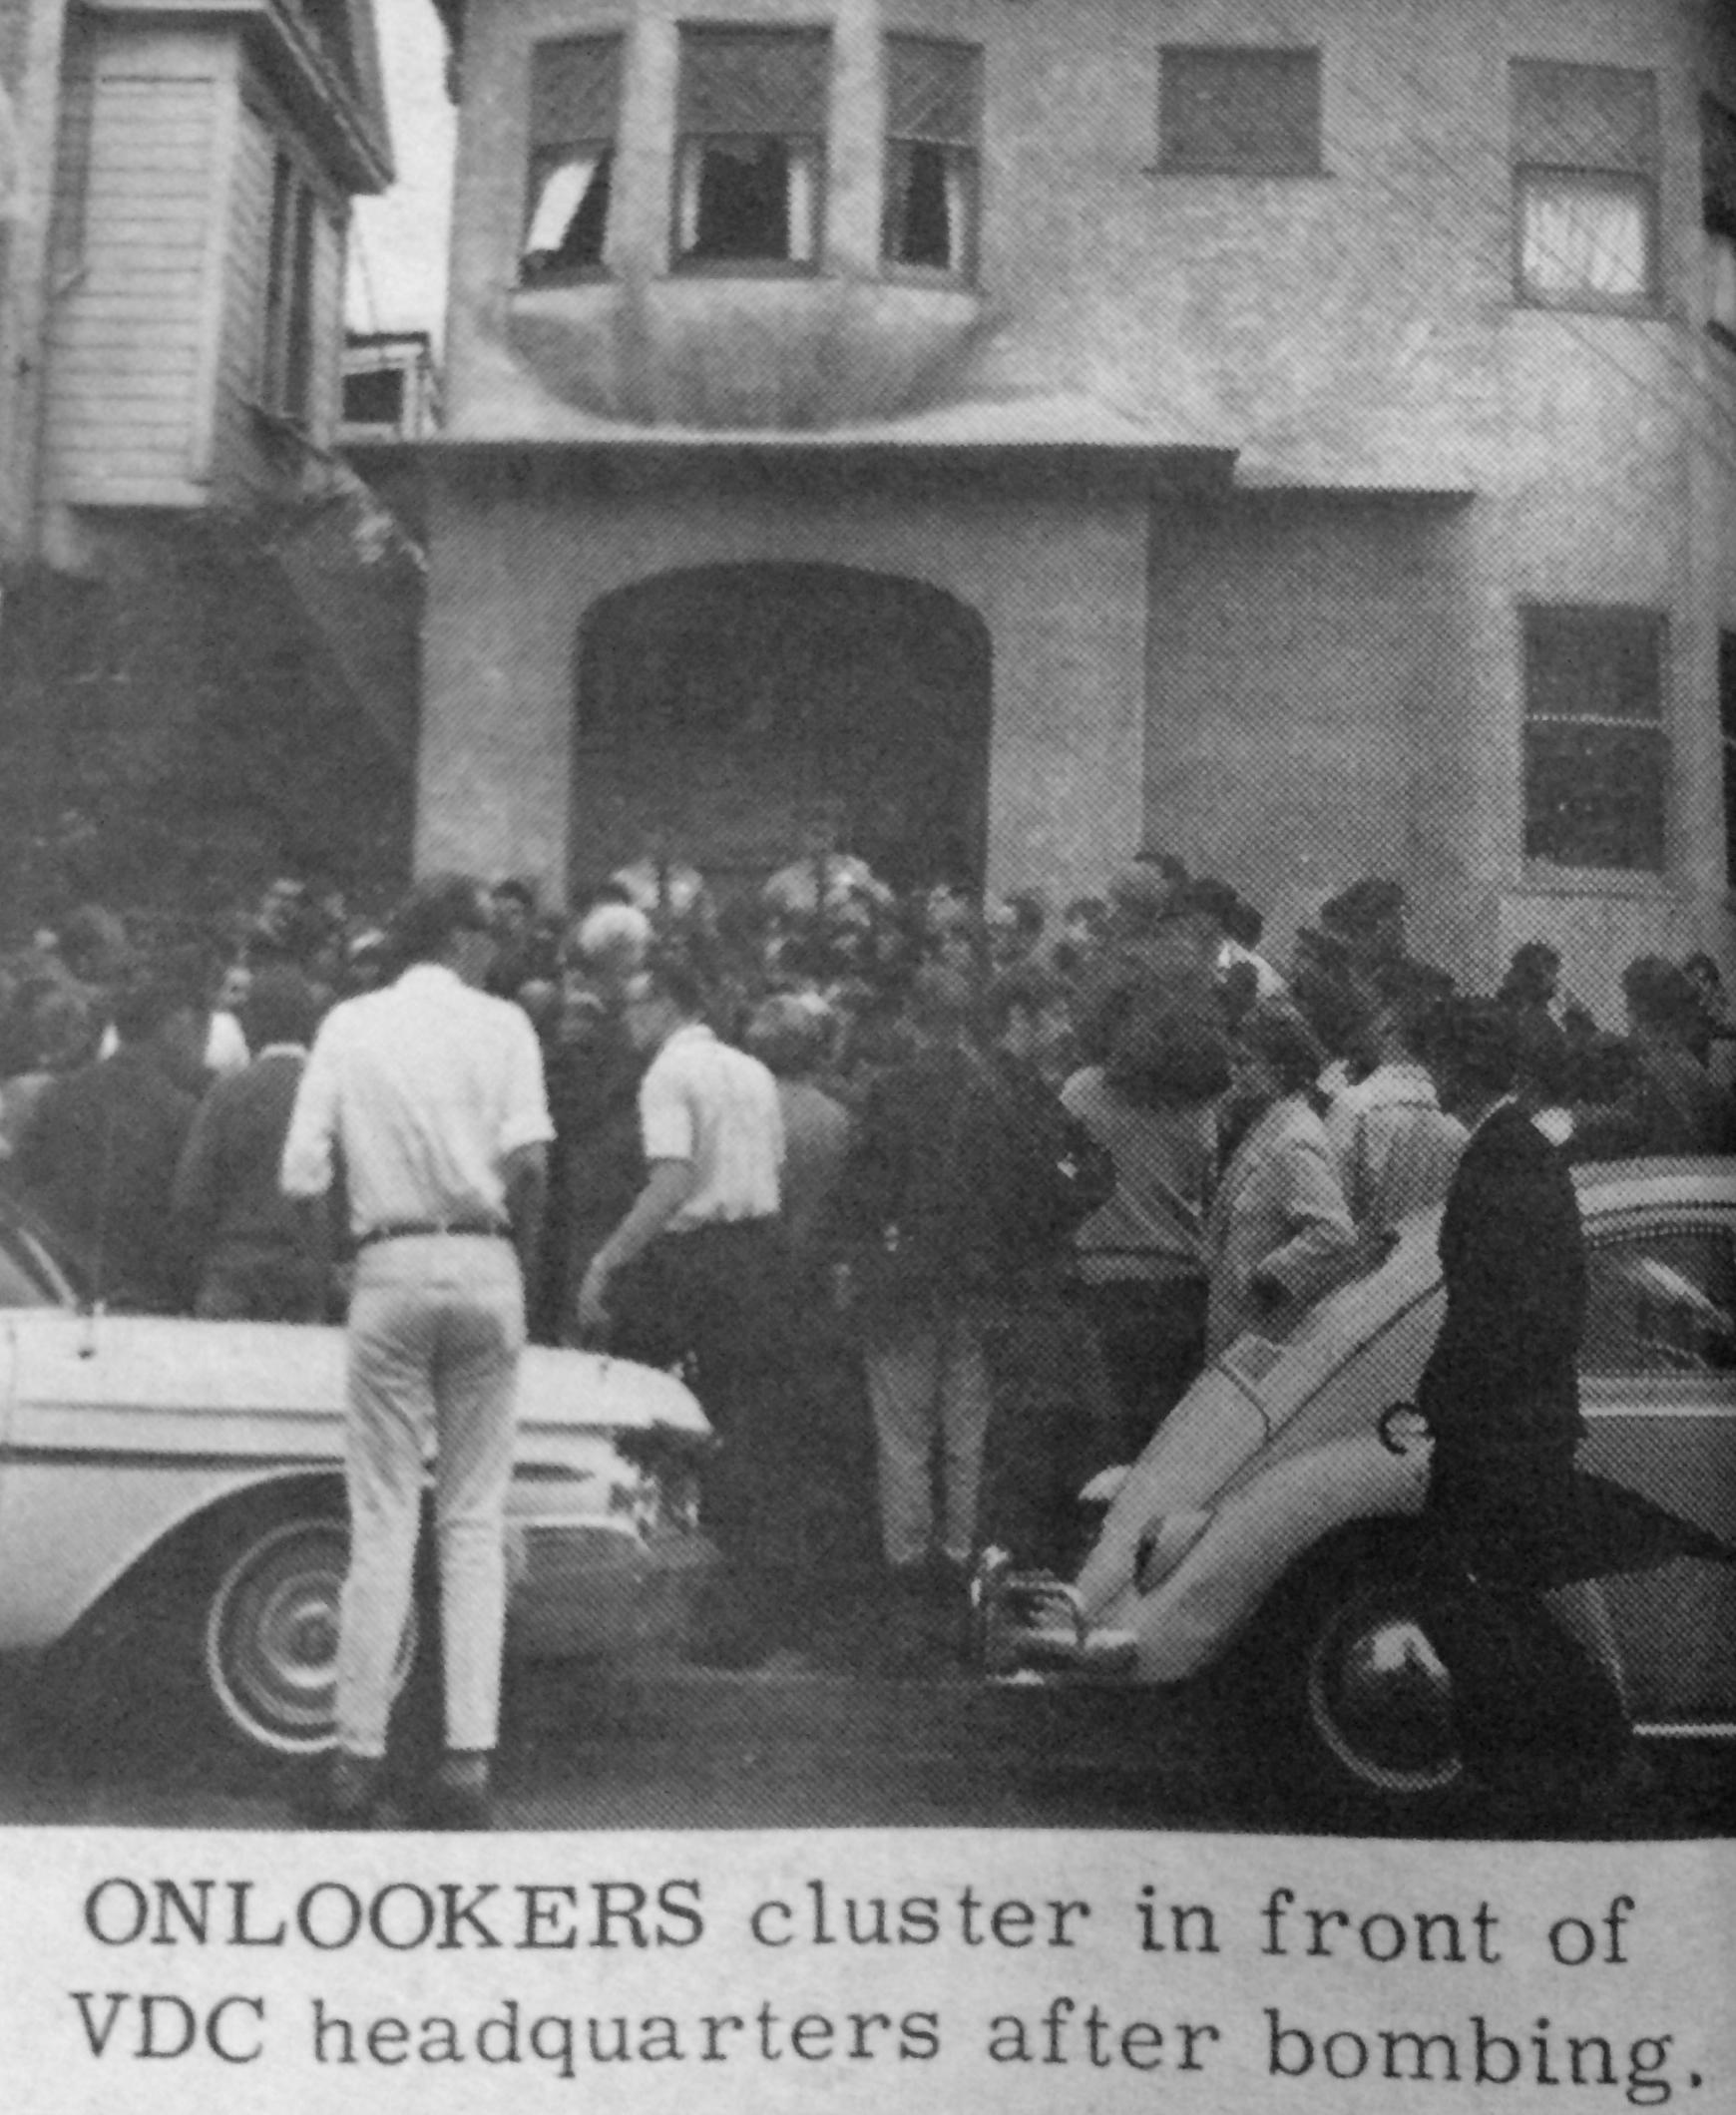 Berkeley Citizen, April 15, 1966